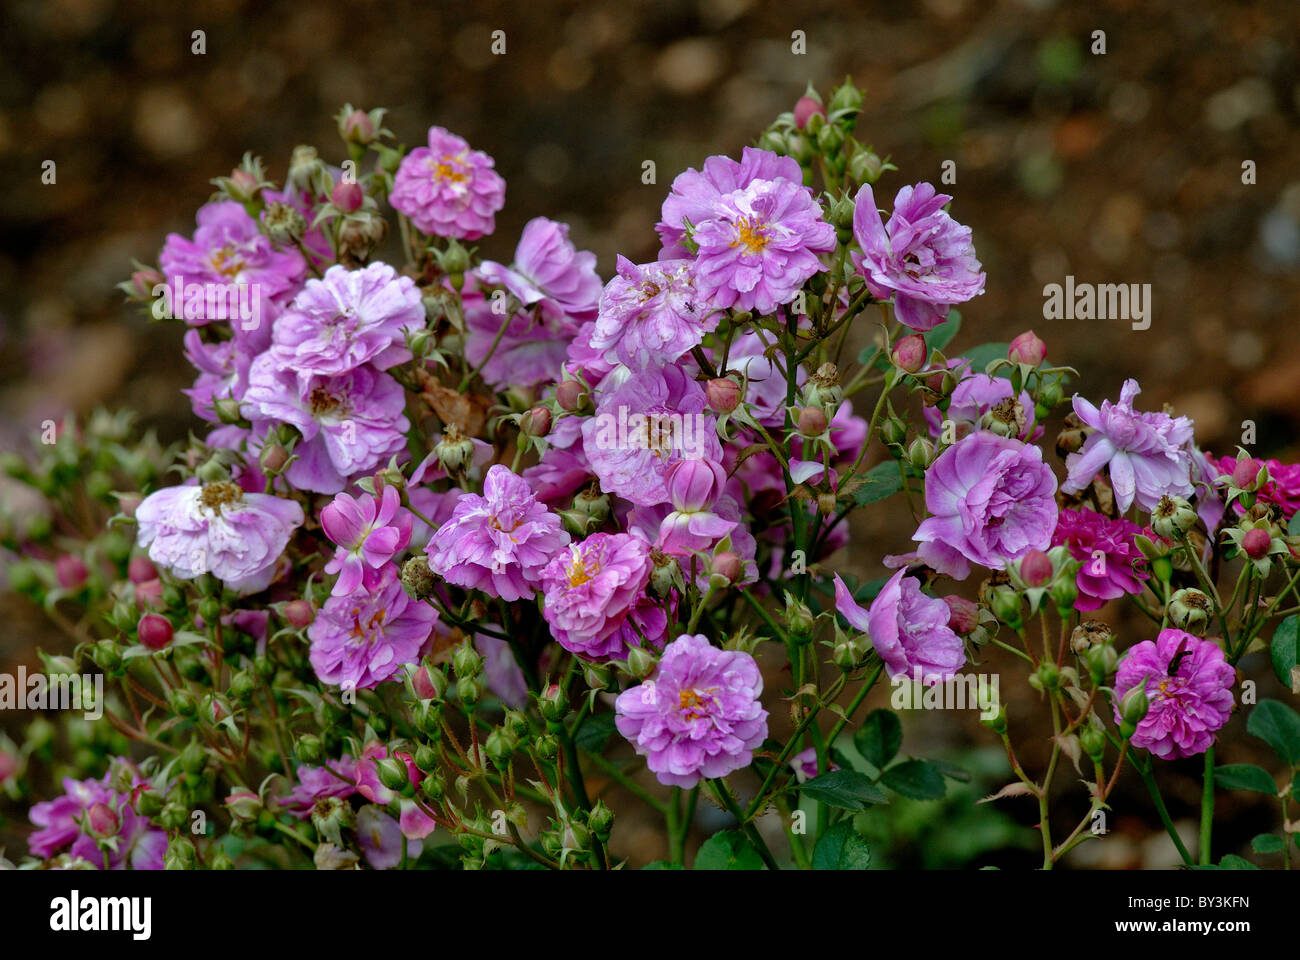 CENTENARY ROSENGARTEN IN OOTY TAMILNADU Stockbild